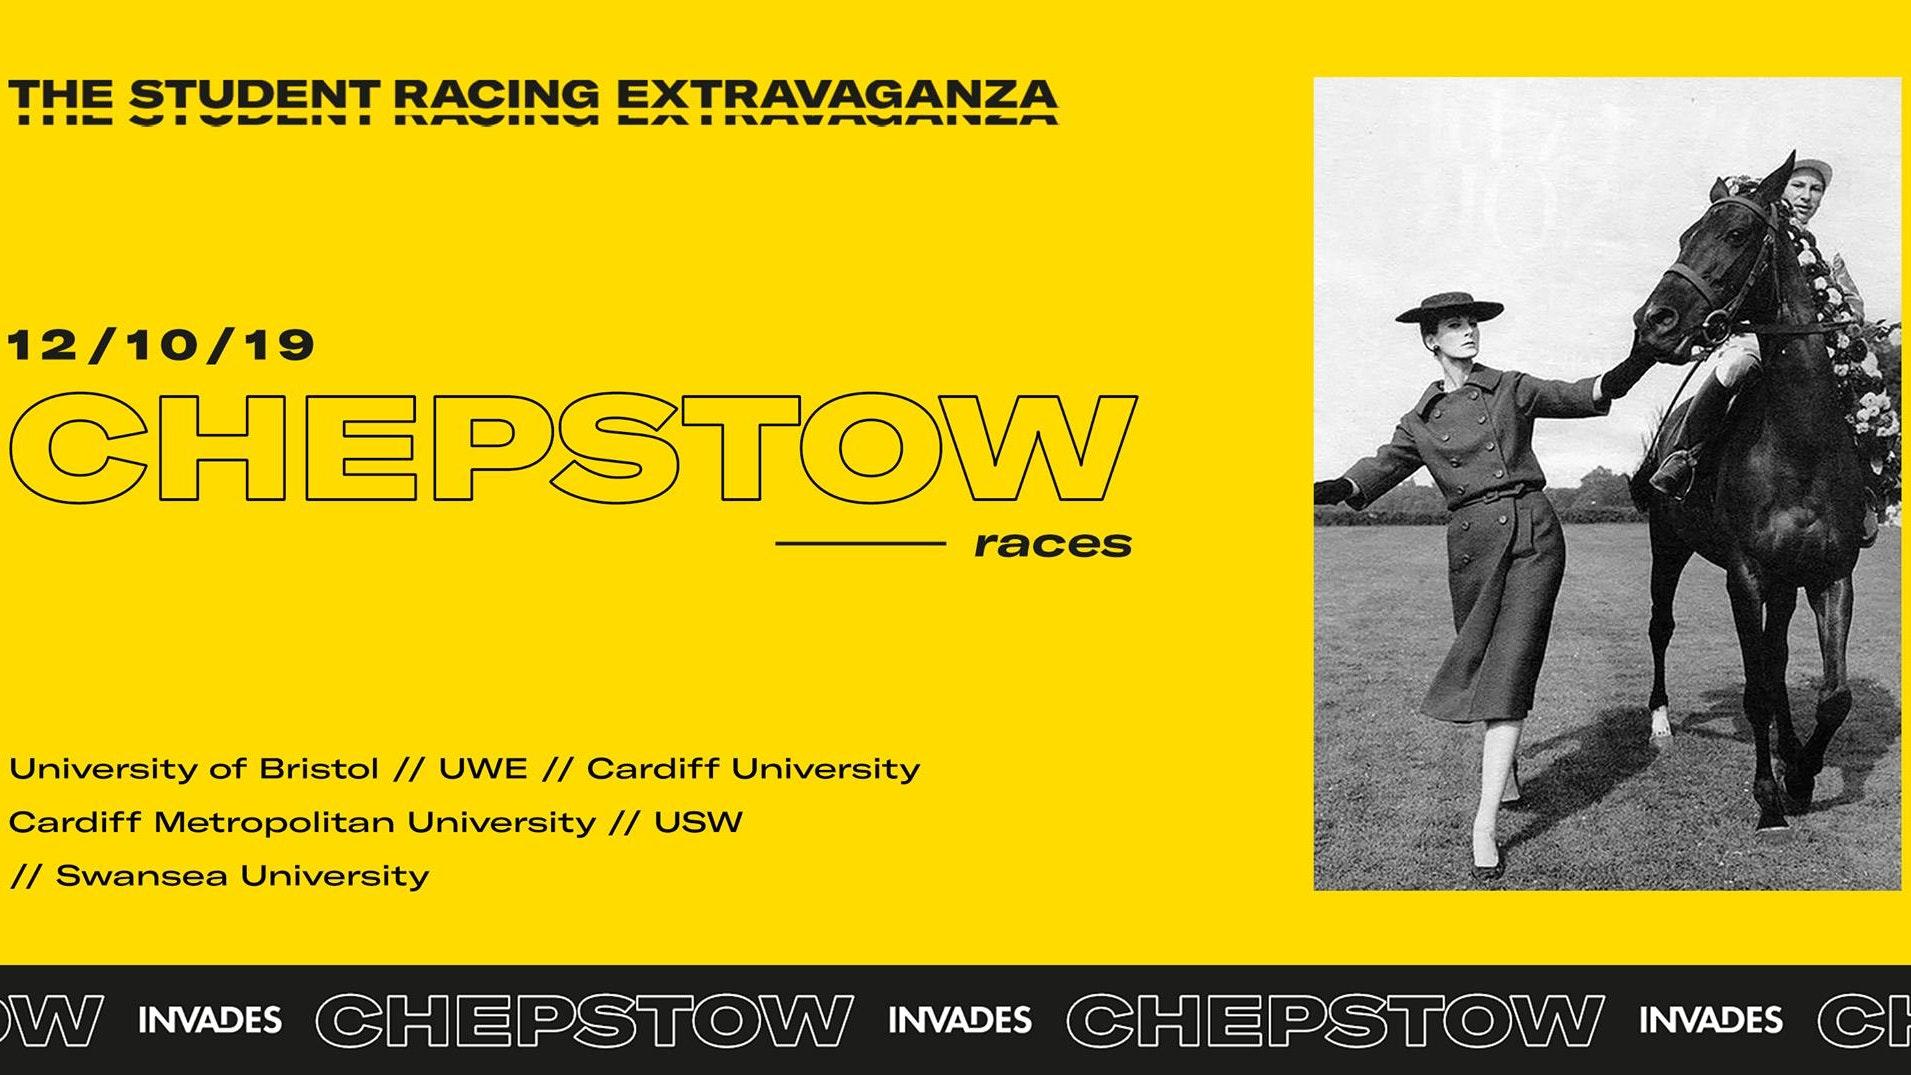 Swansea Invades Chepstow Races